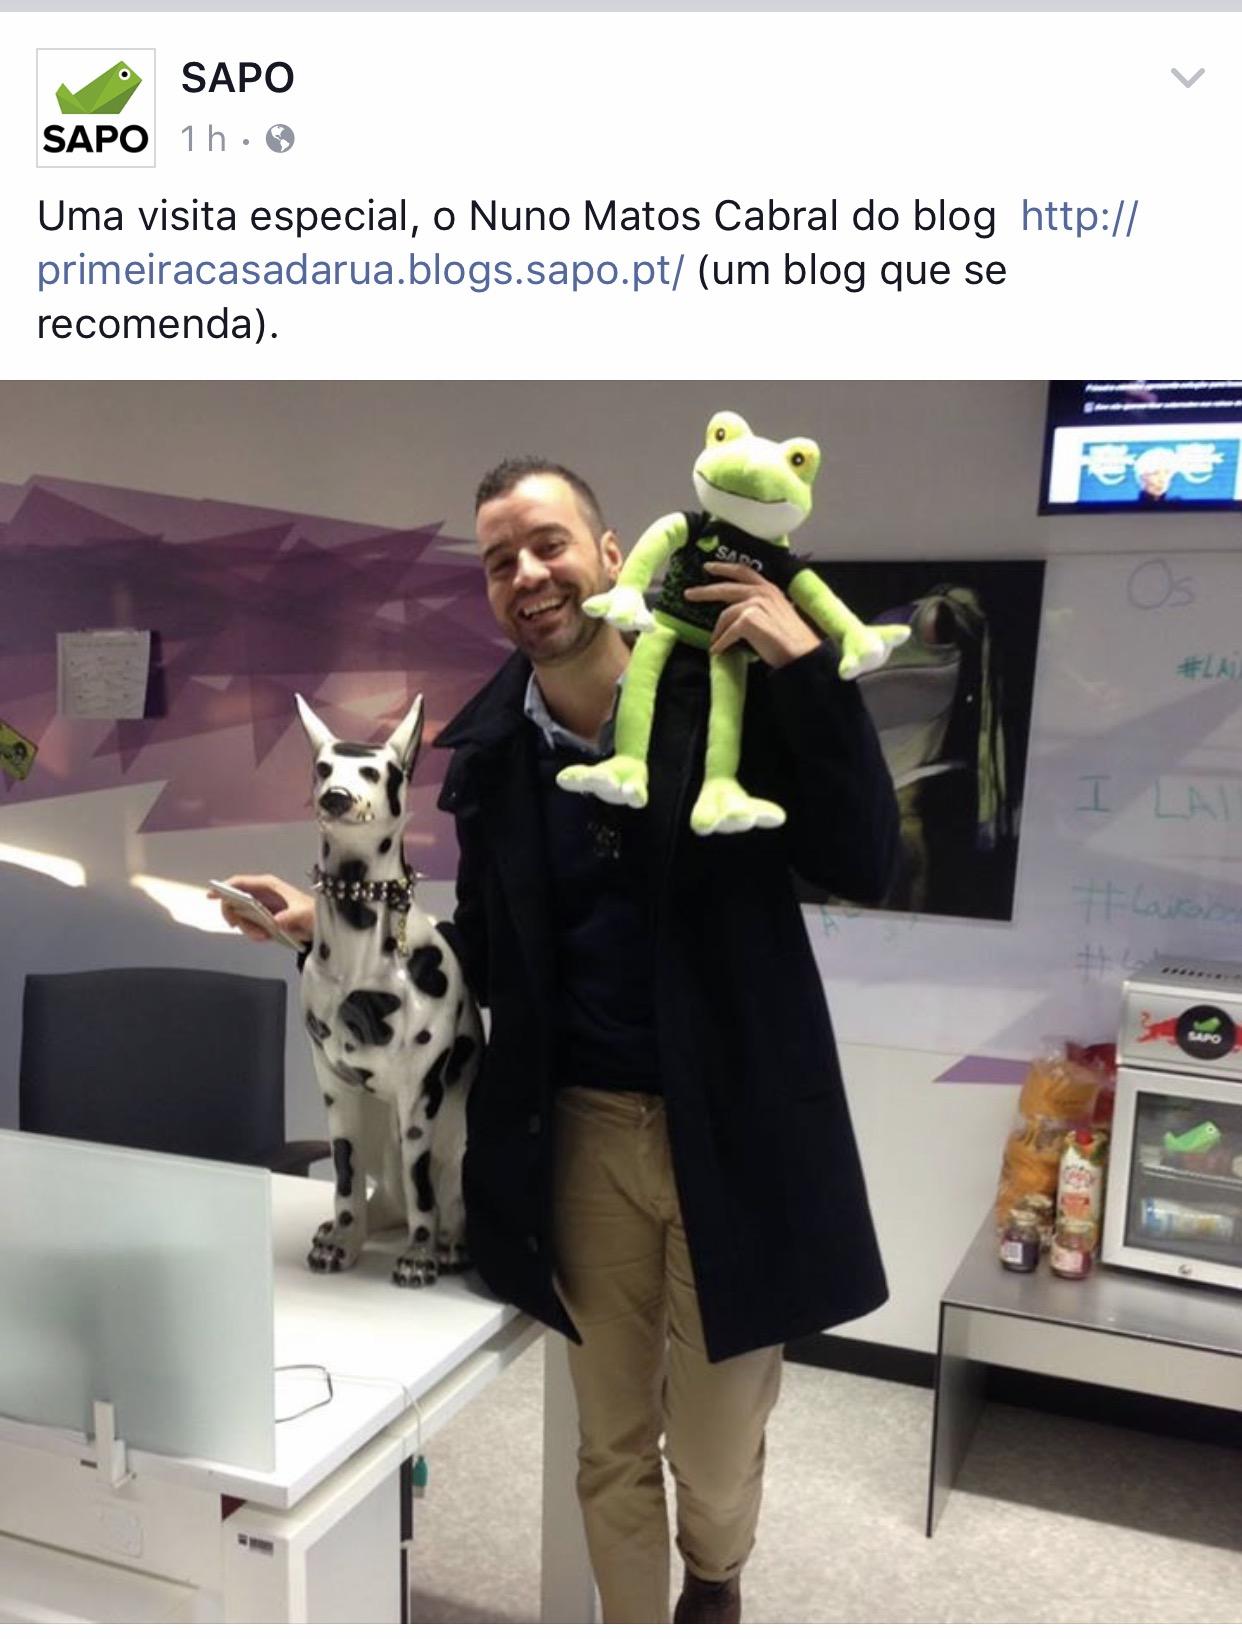 Nuno Matos Cabral @ Sapo.pt